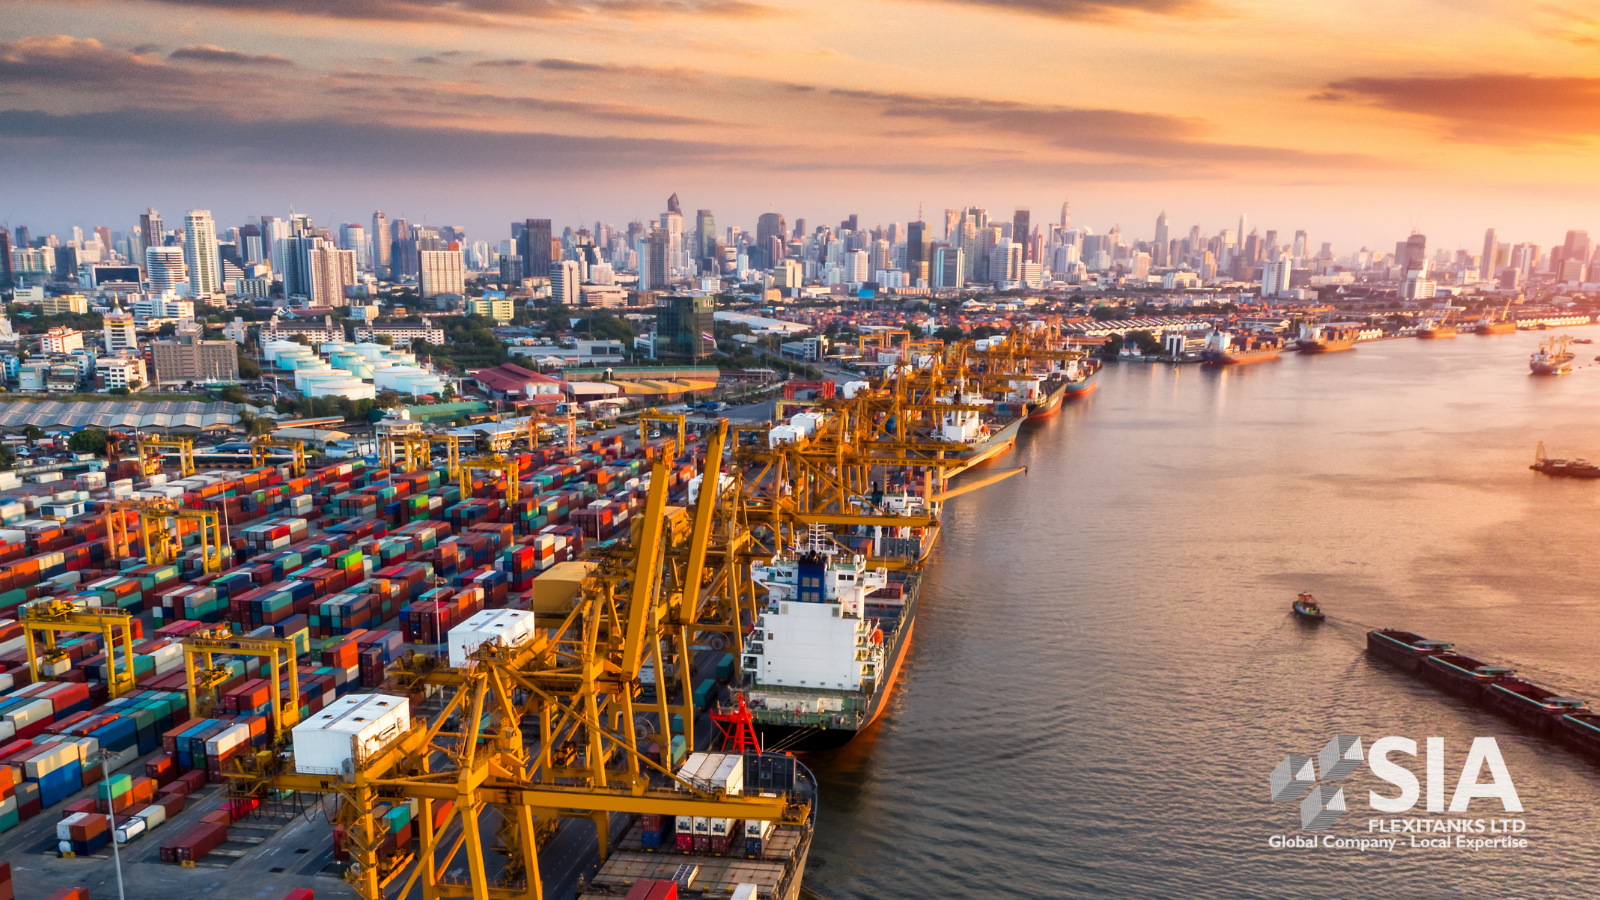 SIA FLEXITANK Advantages of Flexitanks for a Logistics Operator –